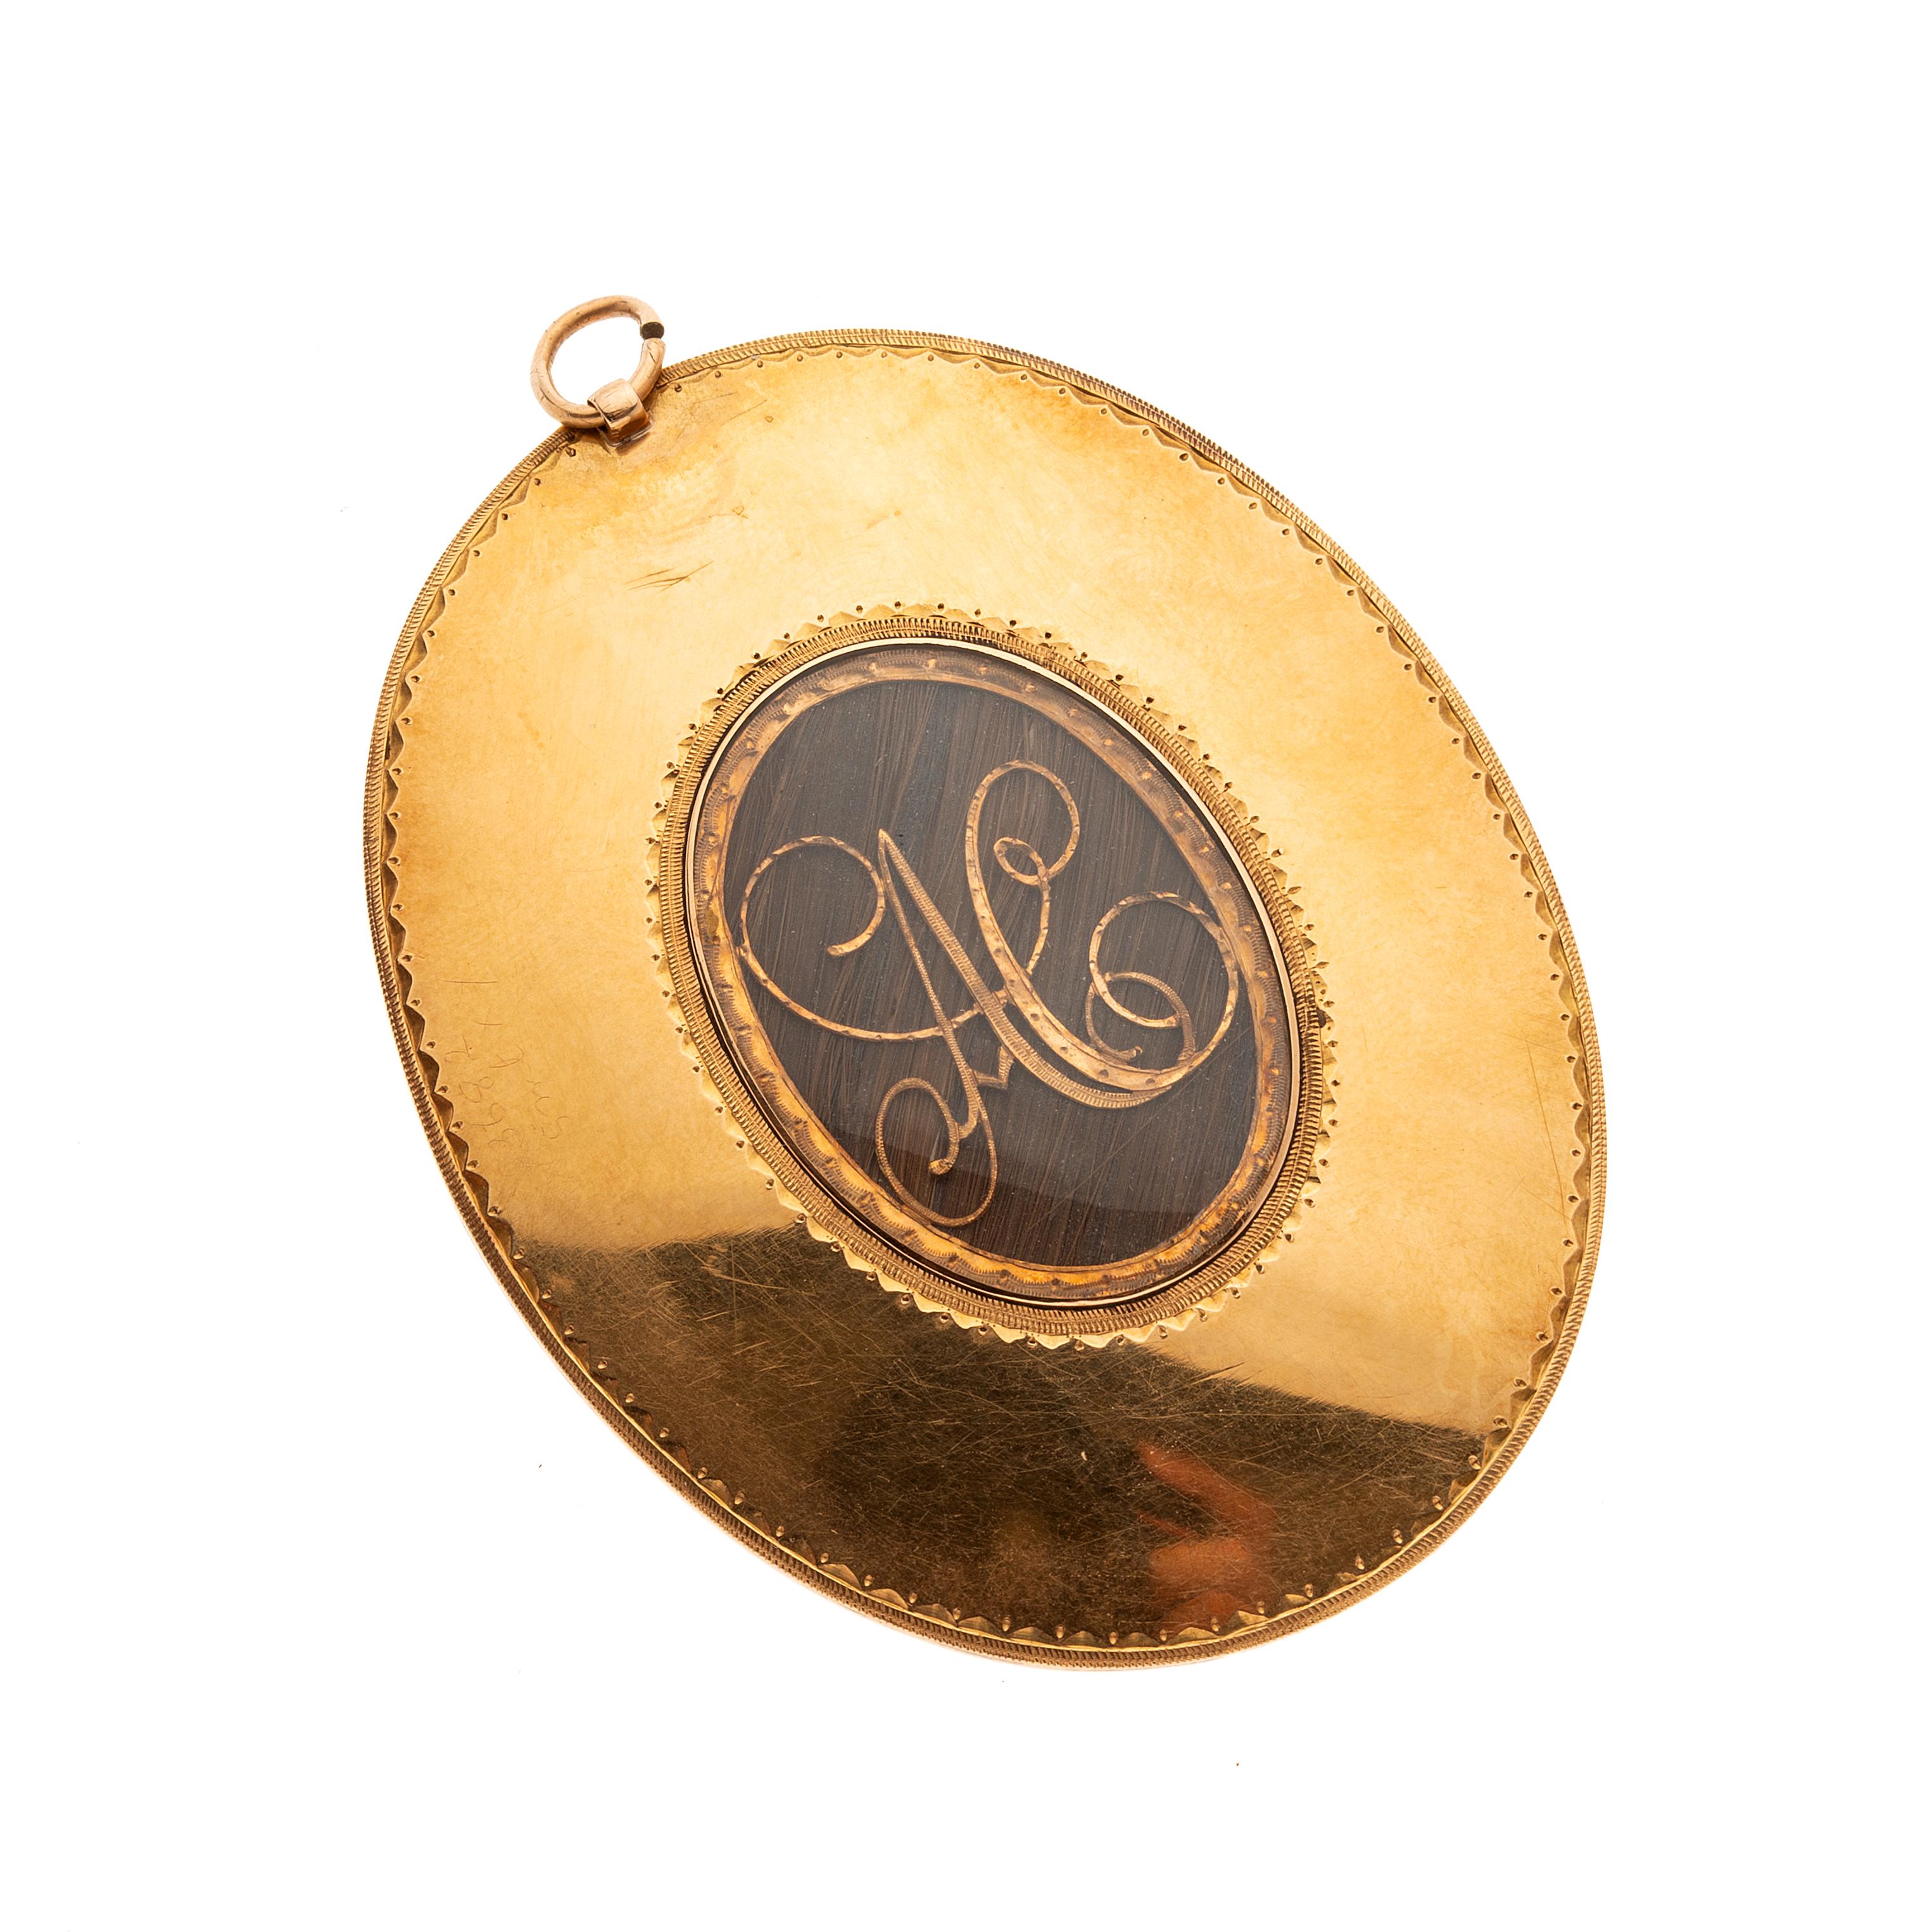 John Smart (1742/ 43-1811), a gold portrait miniature pendant, dated 1788 - Image 2 of 2